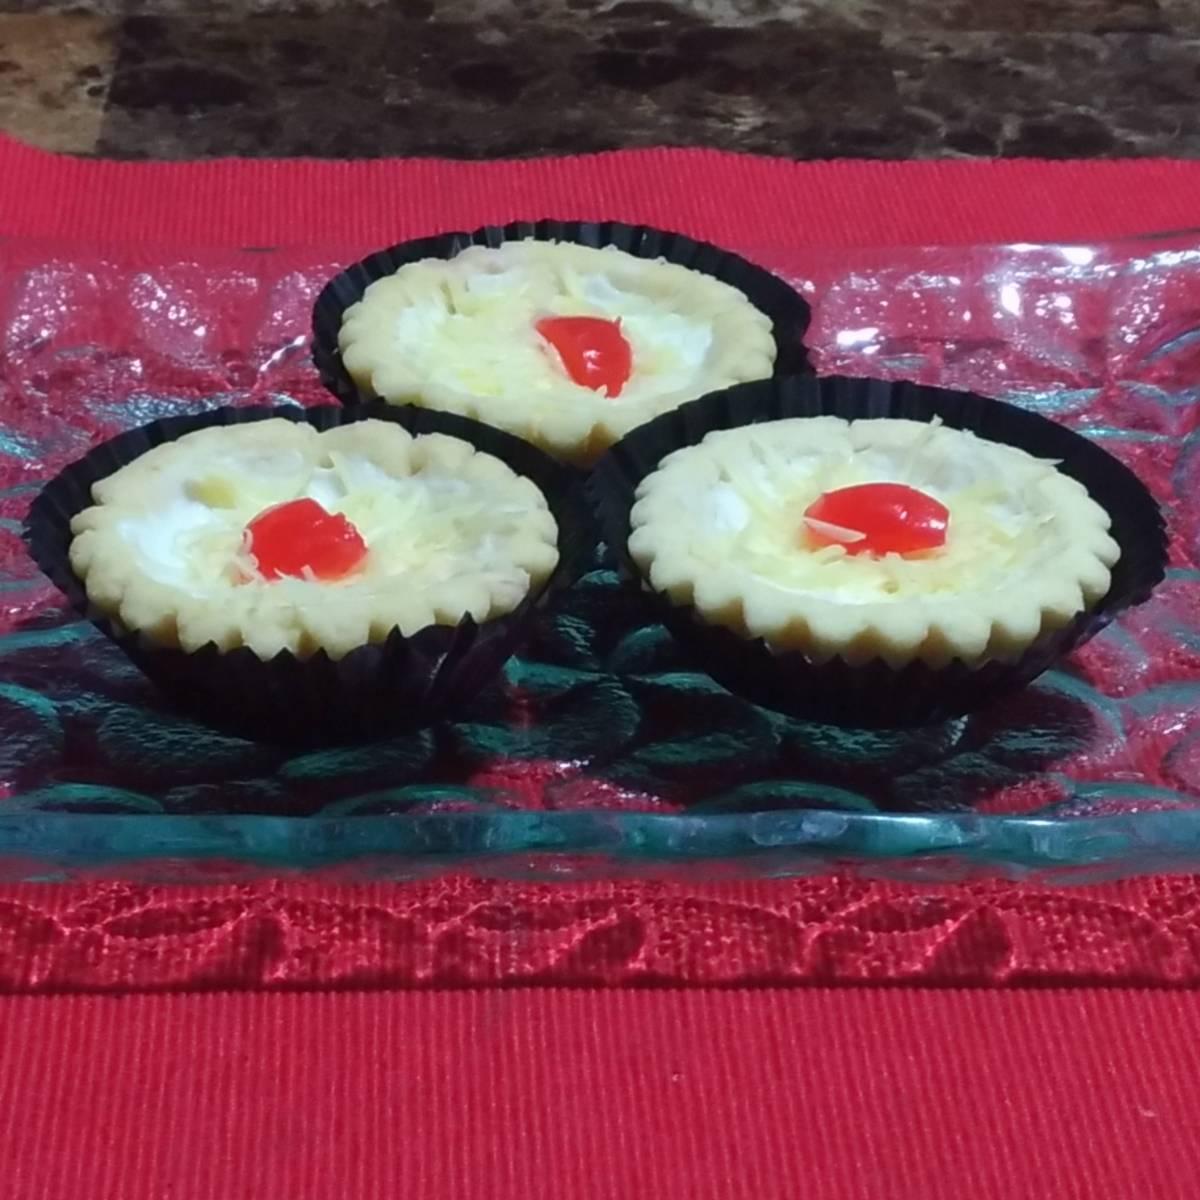 Mini Pie Cheese Cherry Original Crust(paket 3 Pieces)3